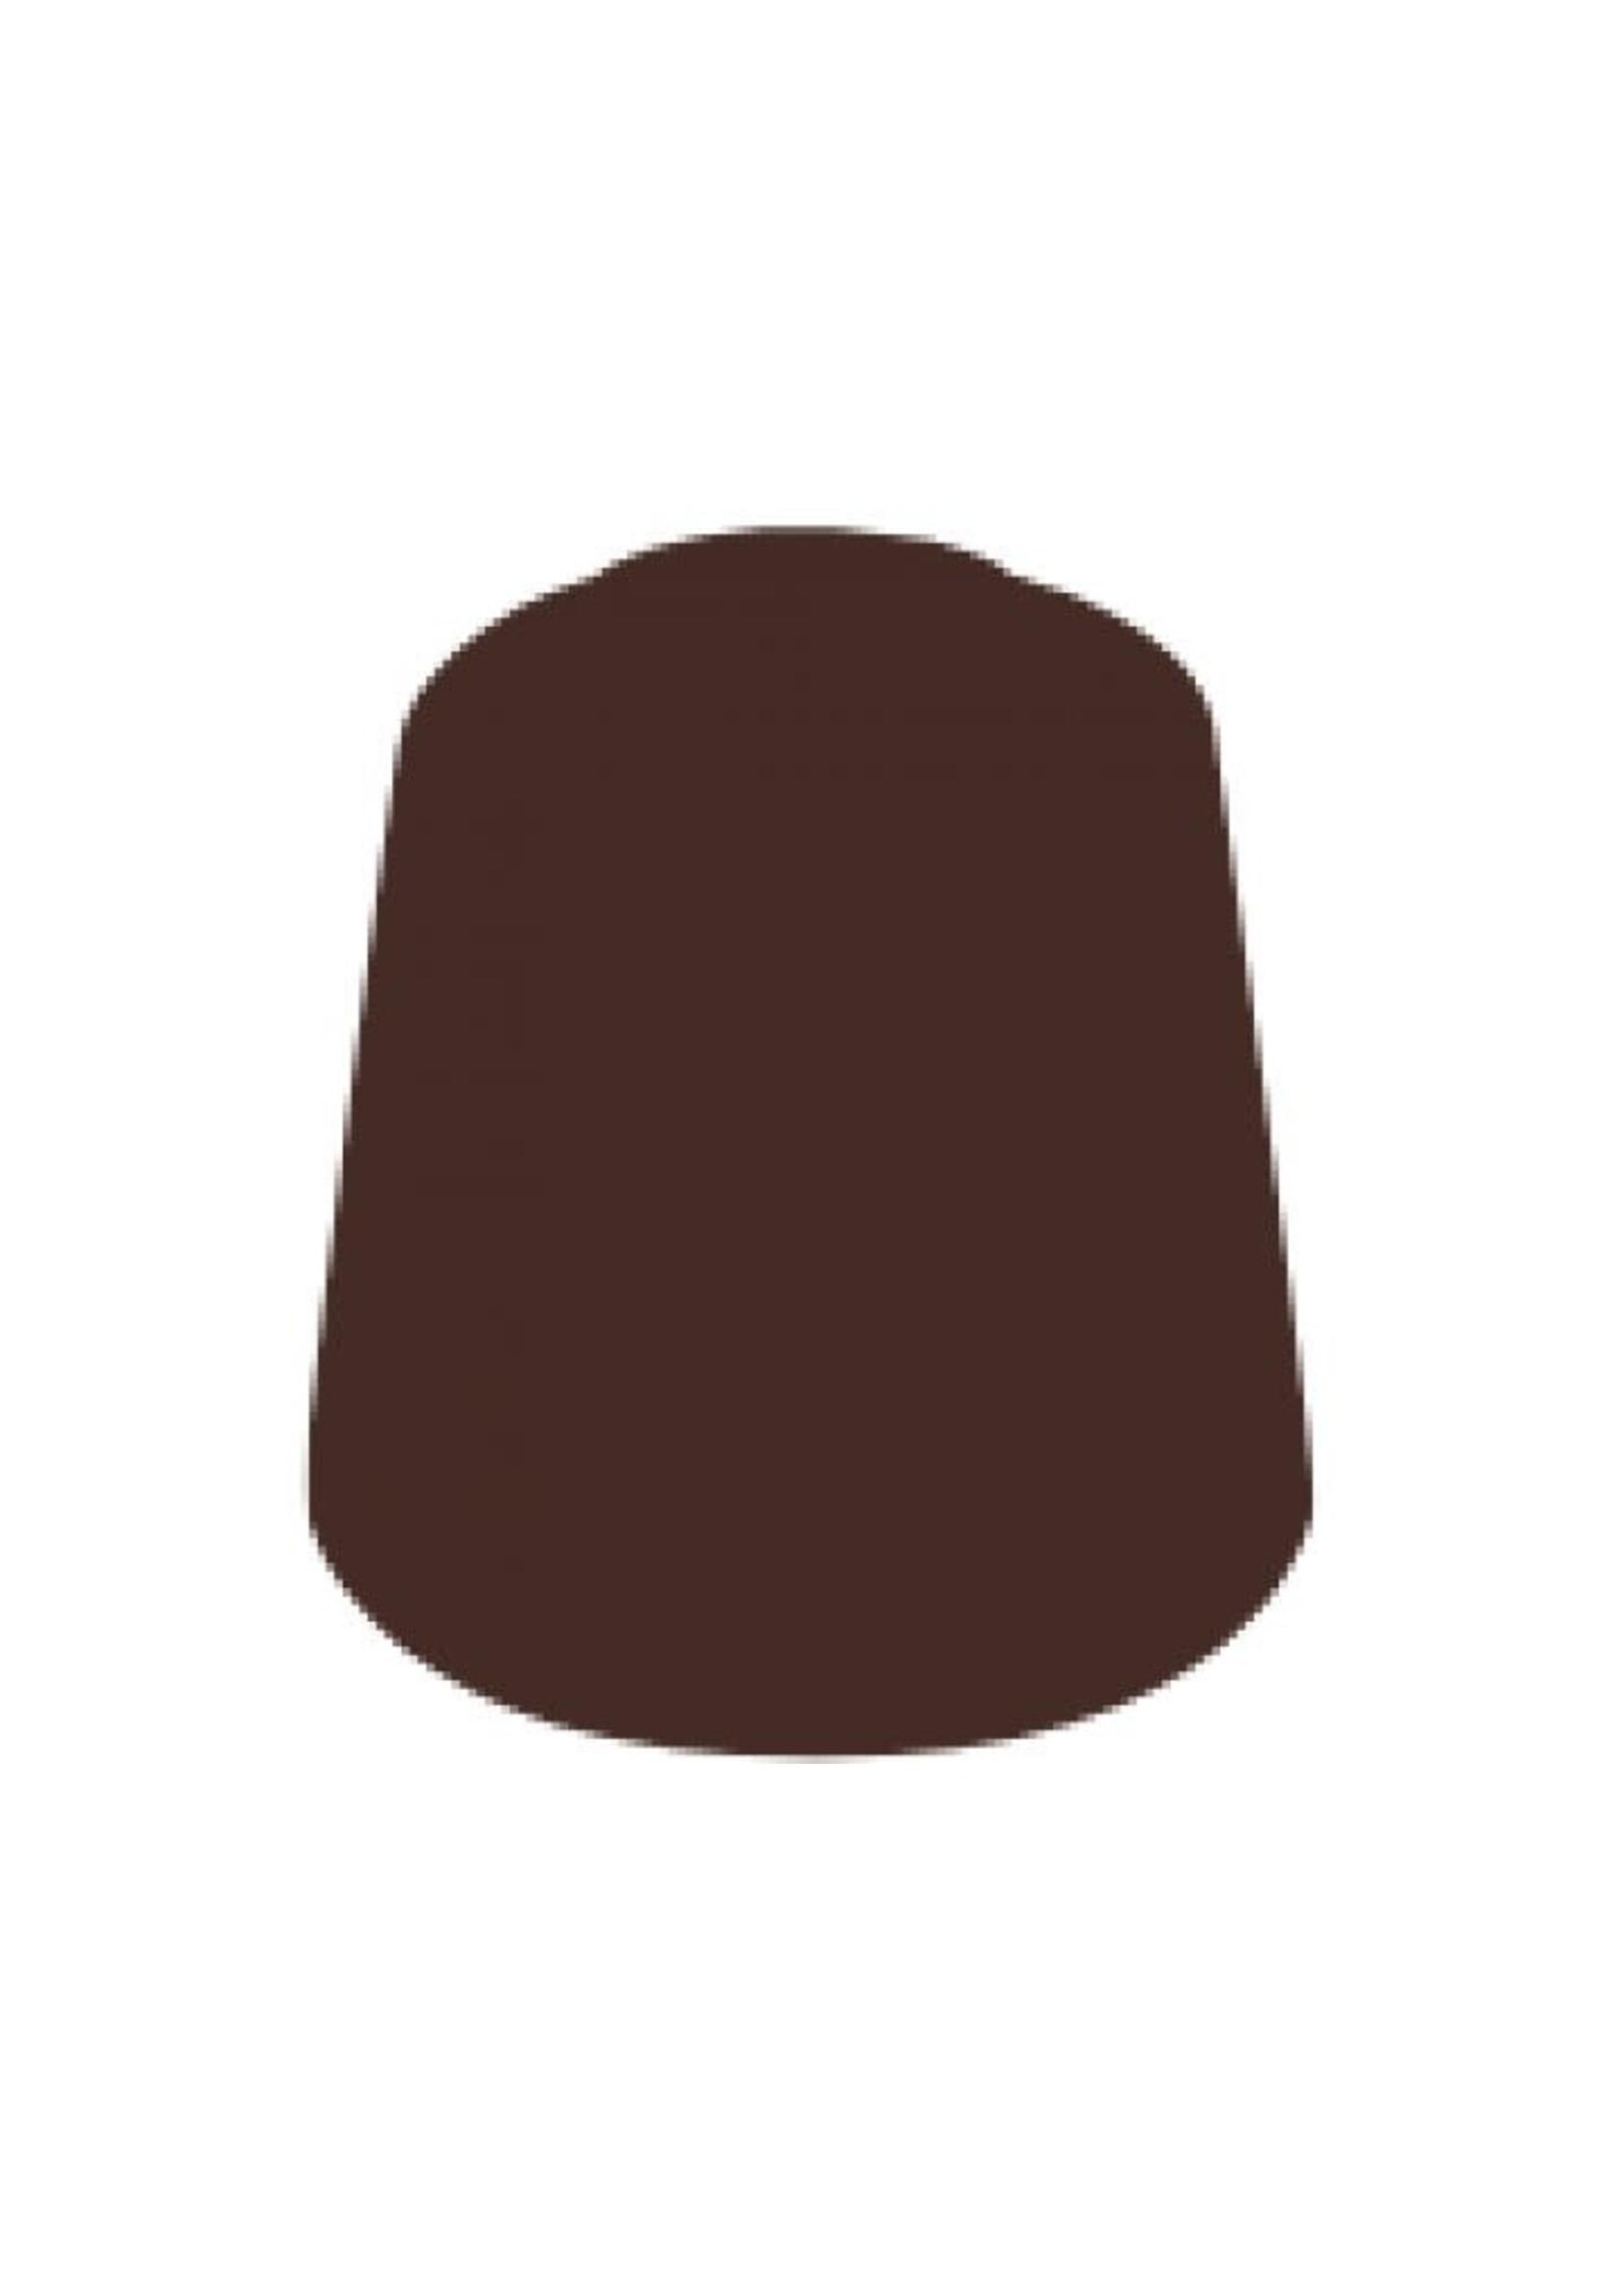 Base: Catachan Fleshtone (12Ml)